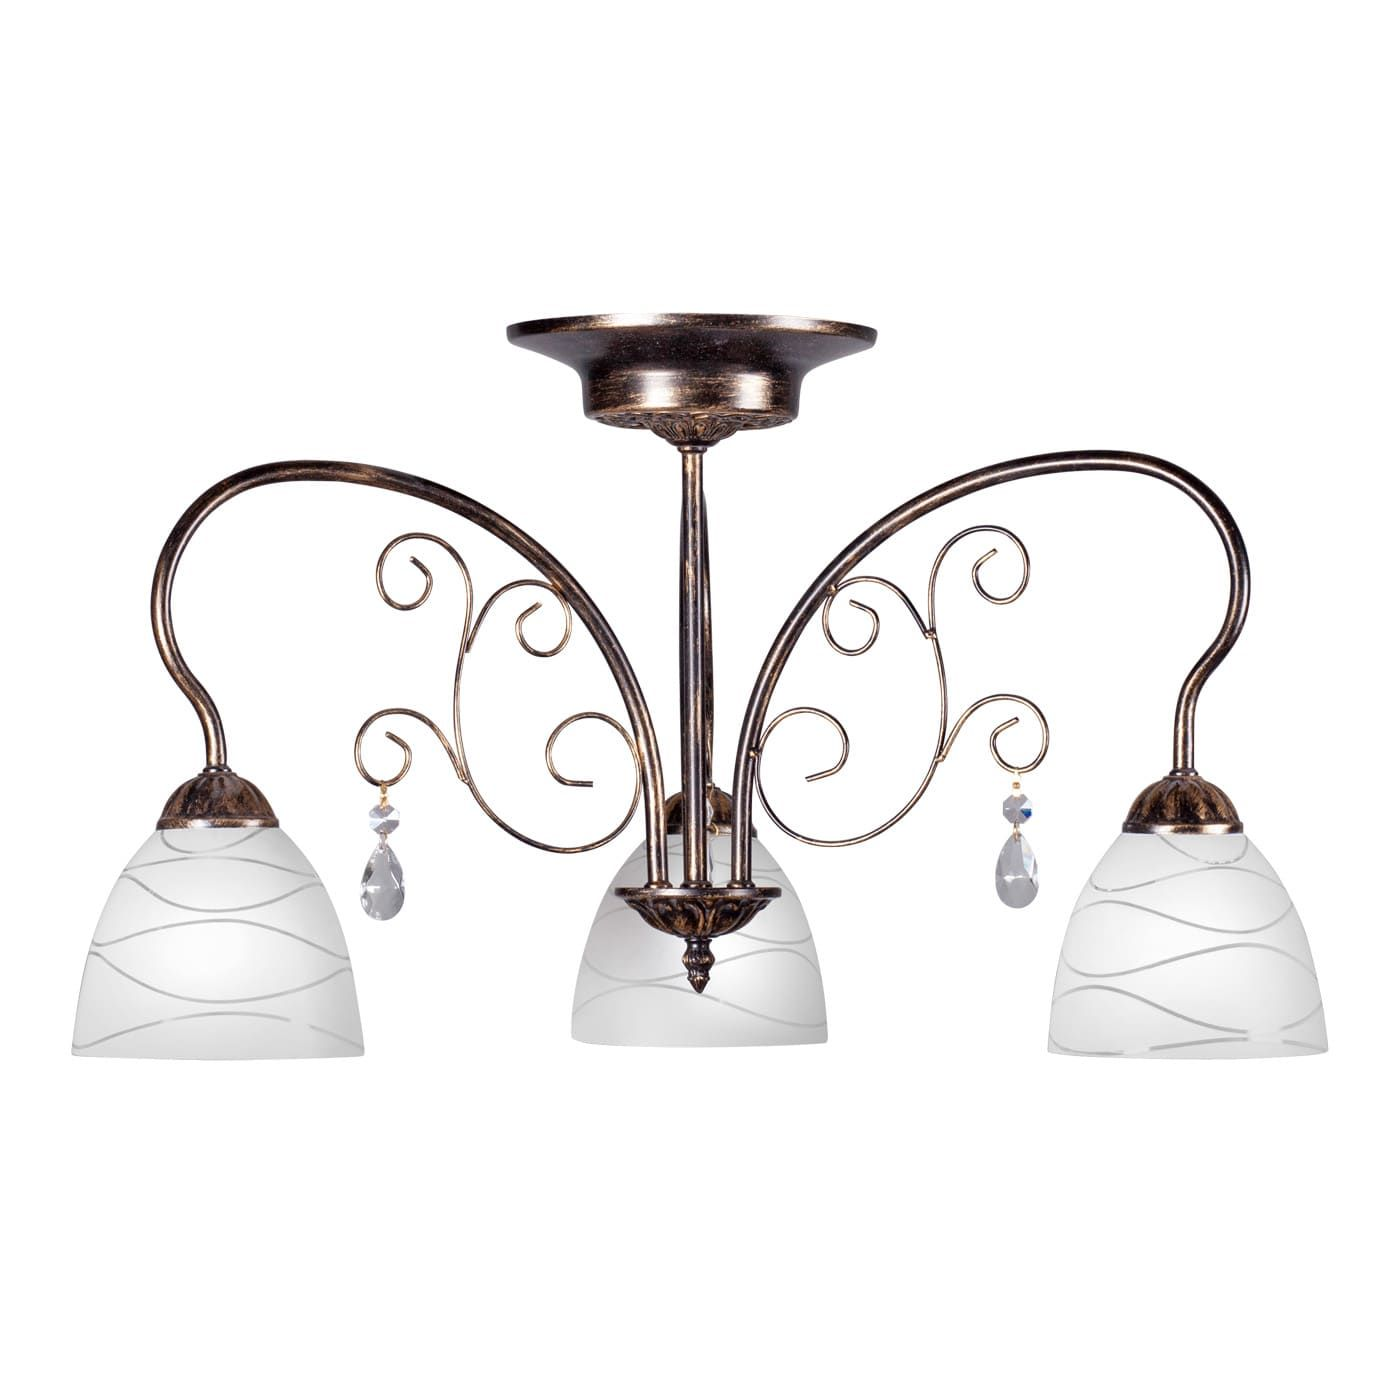 PETRASVET / Ceiling chandelier S2130-3, 3xE27 max. 60W